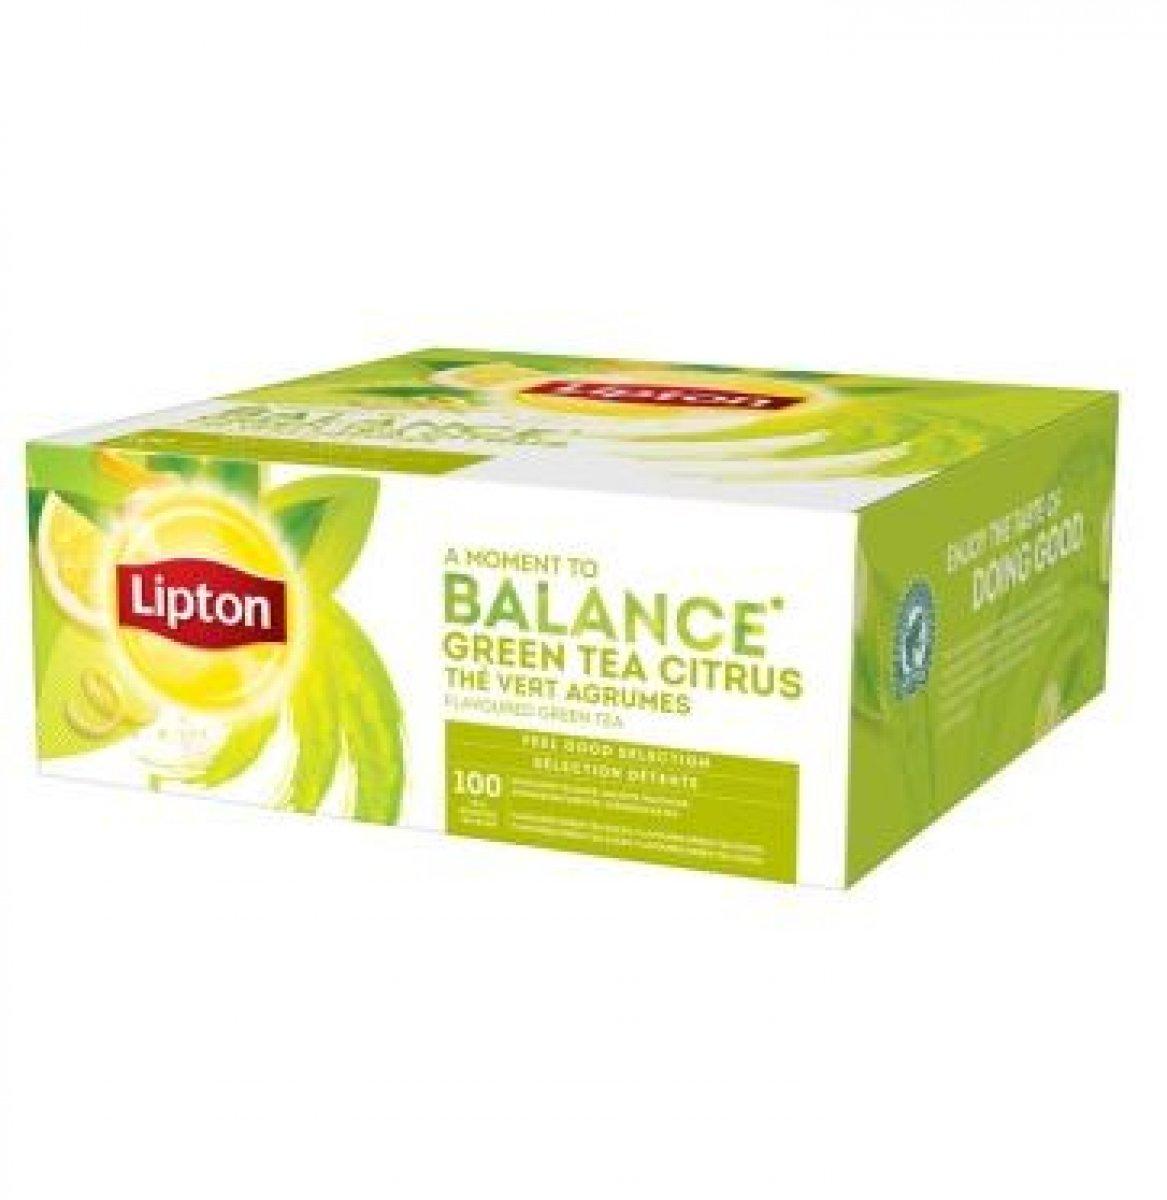 Zielona Herbata Lipton Green Tea Citrus 100 kopert